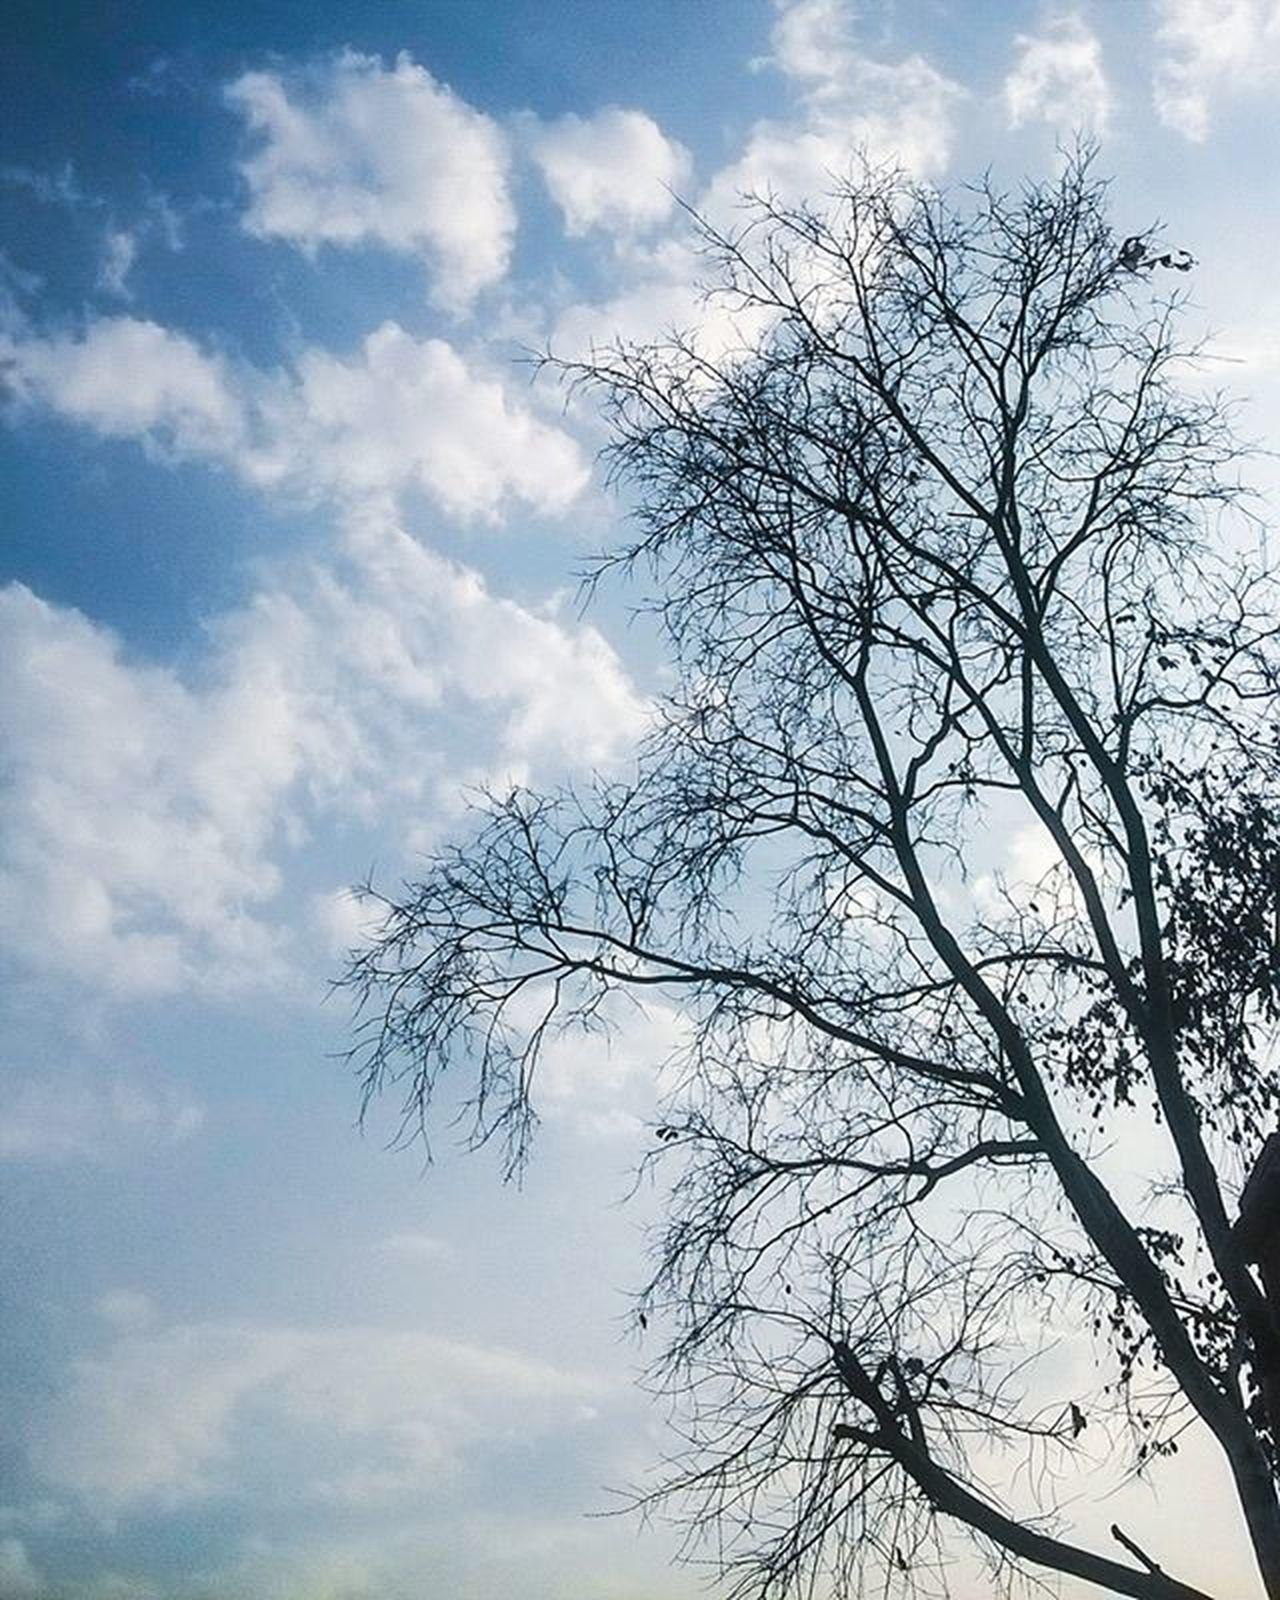 When cloud grows on the tree. Minimaloftheday Naturelovers Minimal_perfection Picoftheday Mobilemag Jaipur Beautiful Minimalism Seasons Instaspring Instagood Minimalove Color Ig_minimalistic Bestoftheday FollowUS Followme Followuser Minimalhunter Tree Pretty Love Photooftheday Abstractartist Killerminimal followforfollow iiframe cloudporn cloudchaser abstractart